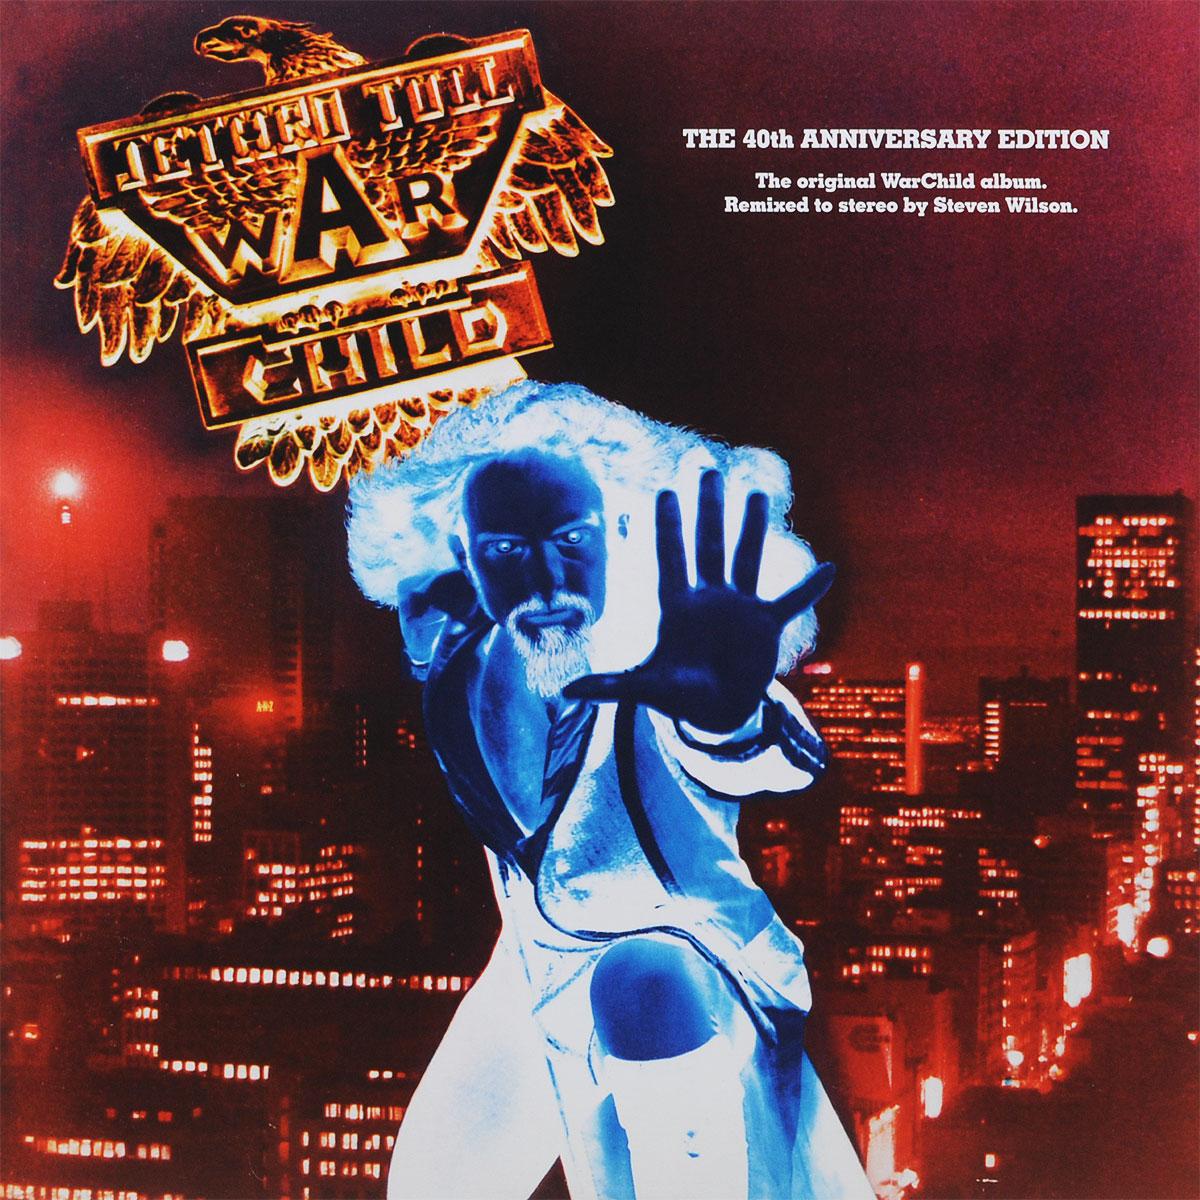 Jethro Tull Jethro Tull. Warchild (The 40th Anniversary Theatre Edition) (LP) jethro tull jethro tull live at carnegie hall 1970 2 lp